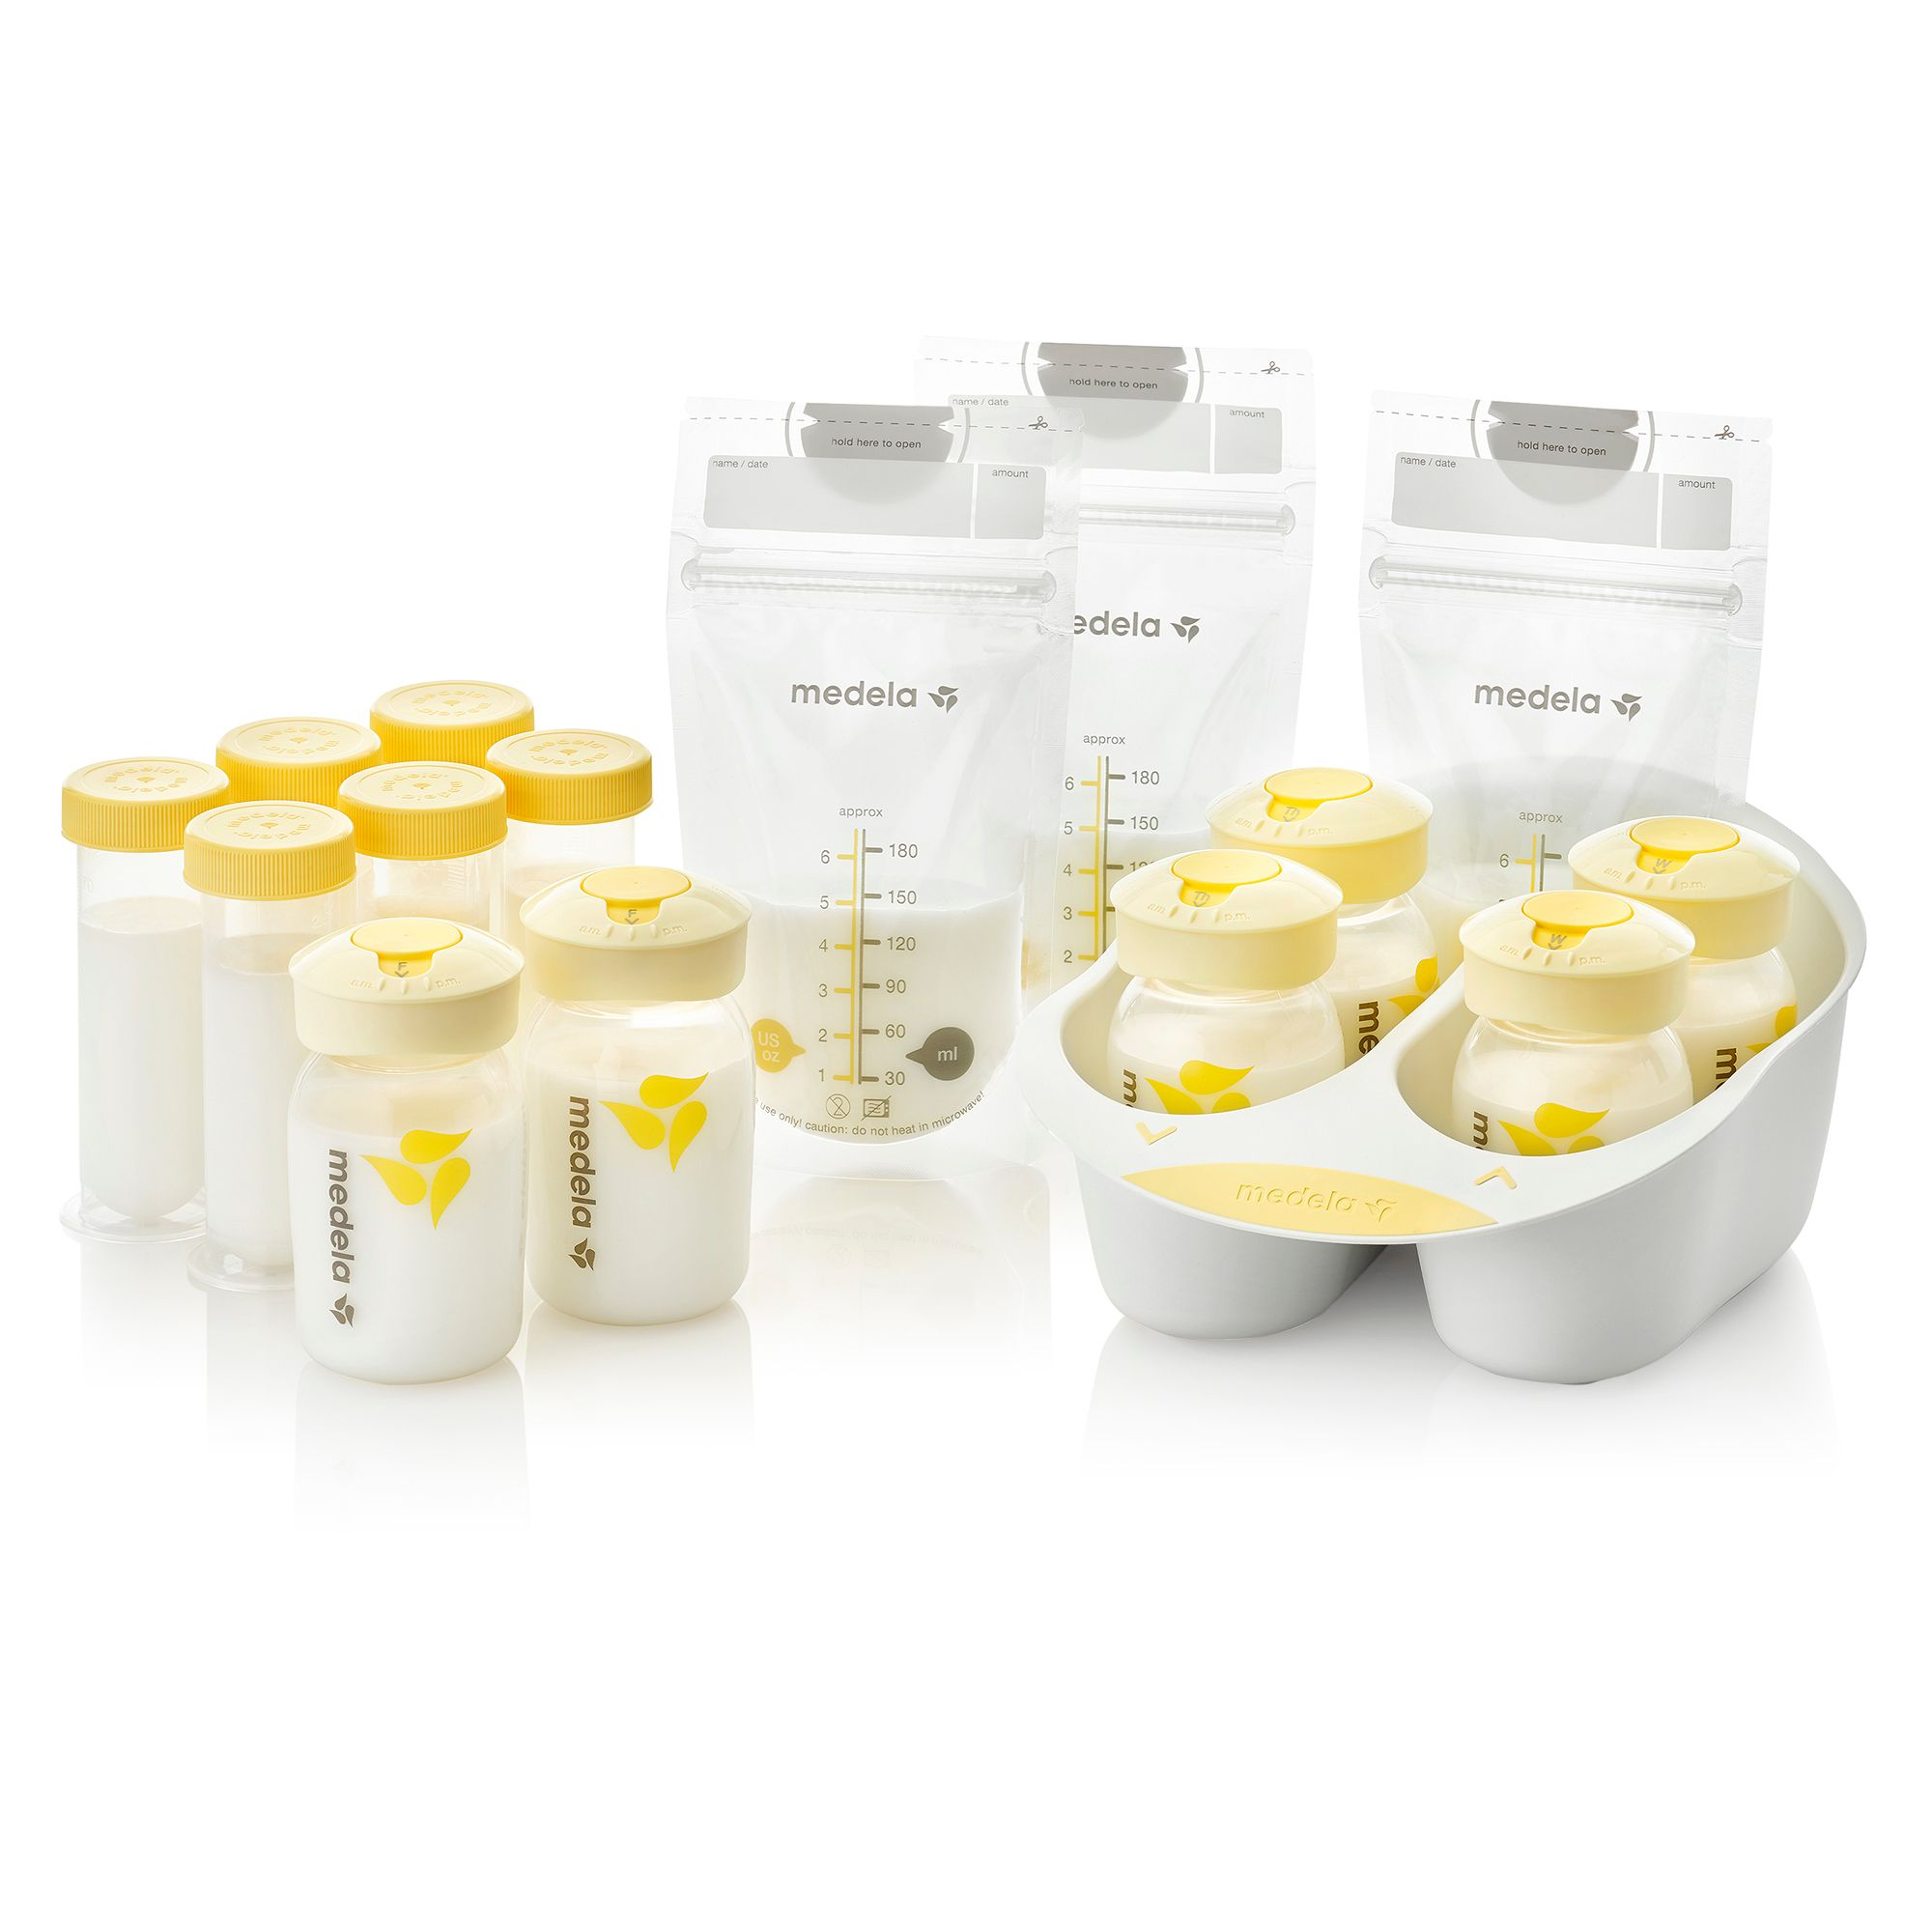 Medela Breastmilk Storage Solution buybuy BABY